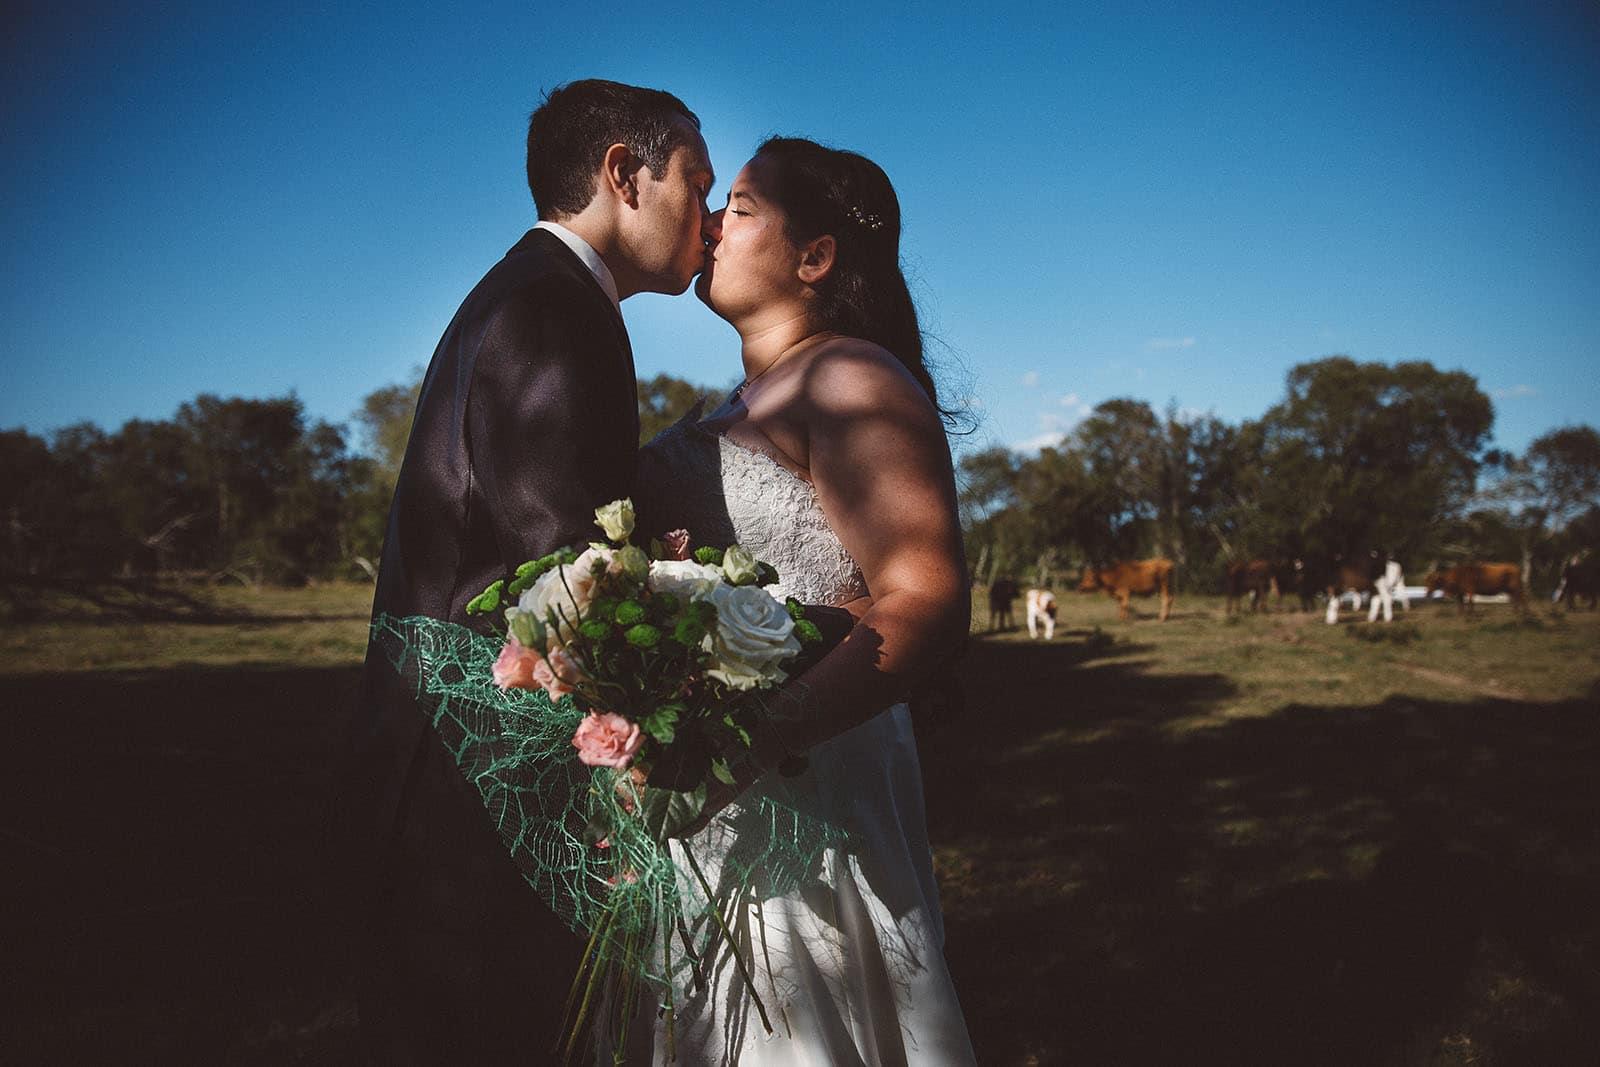 day-after-cheval-photographe-mariage-castille-alma-bordeaux-lacanau (27)